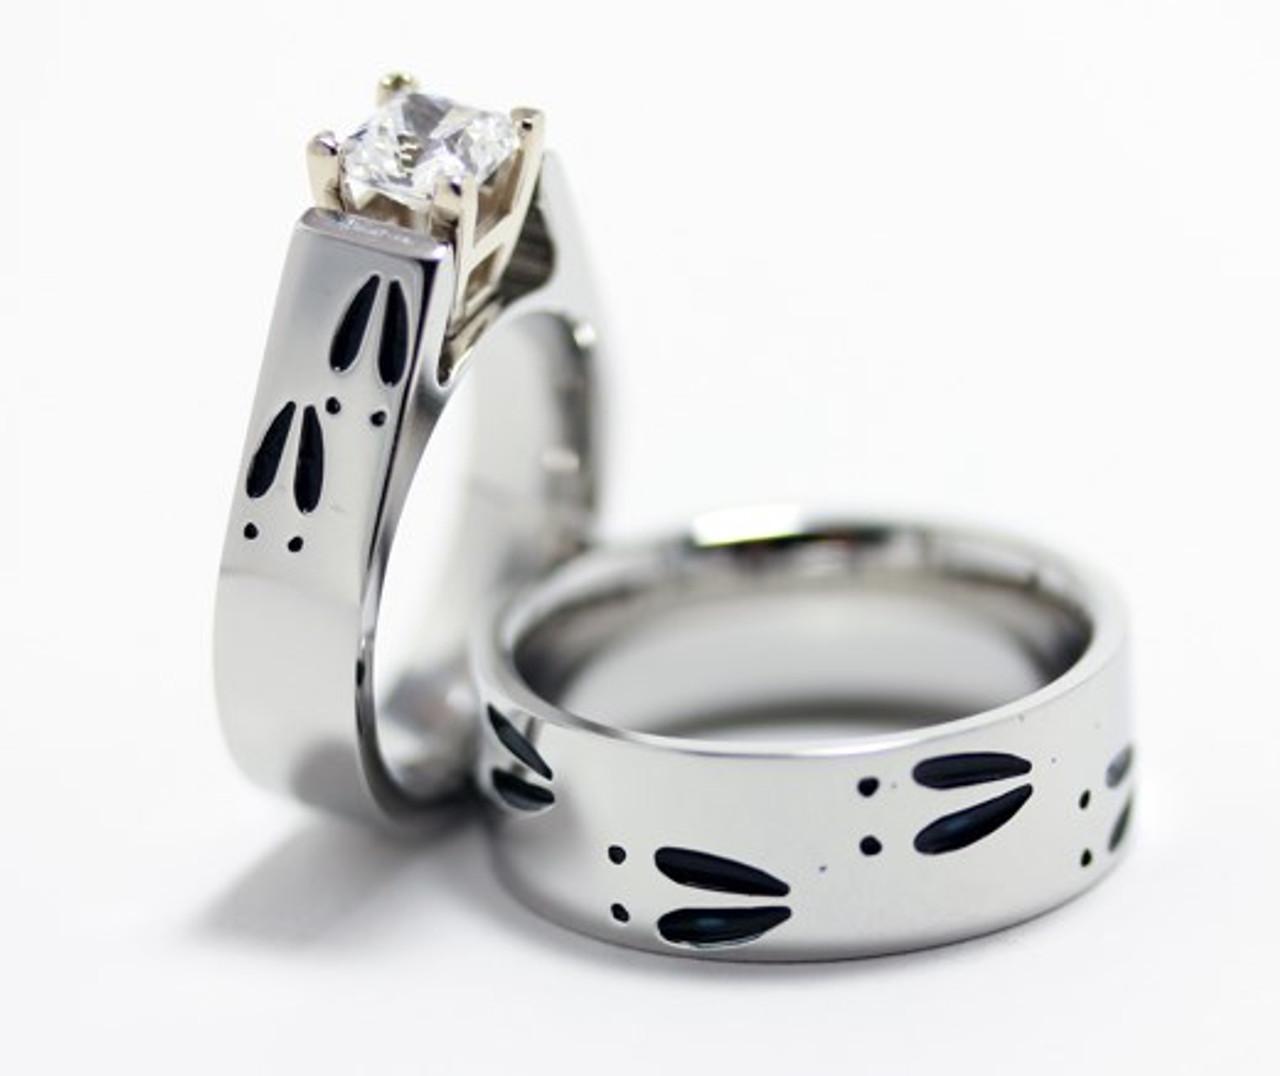 Cobalt Chrome Deer Track Wedding Rings Set TitaniumBuzz